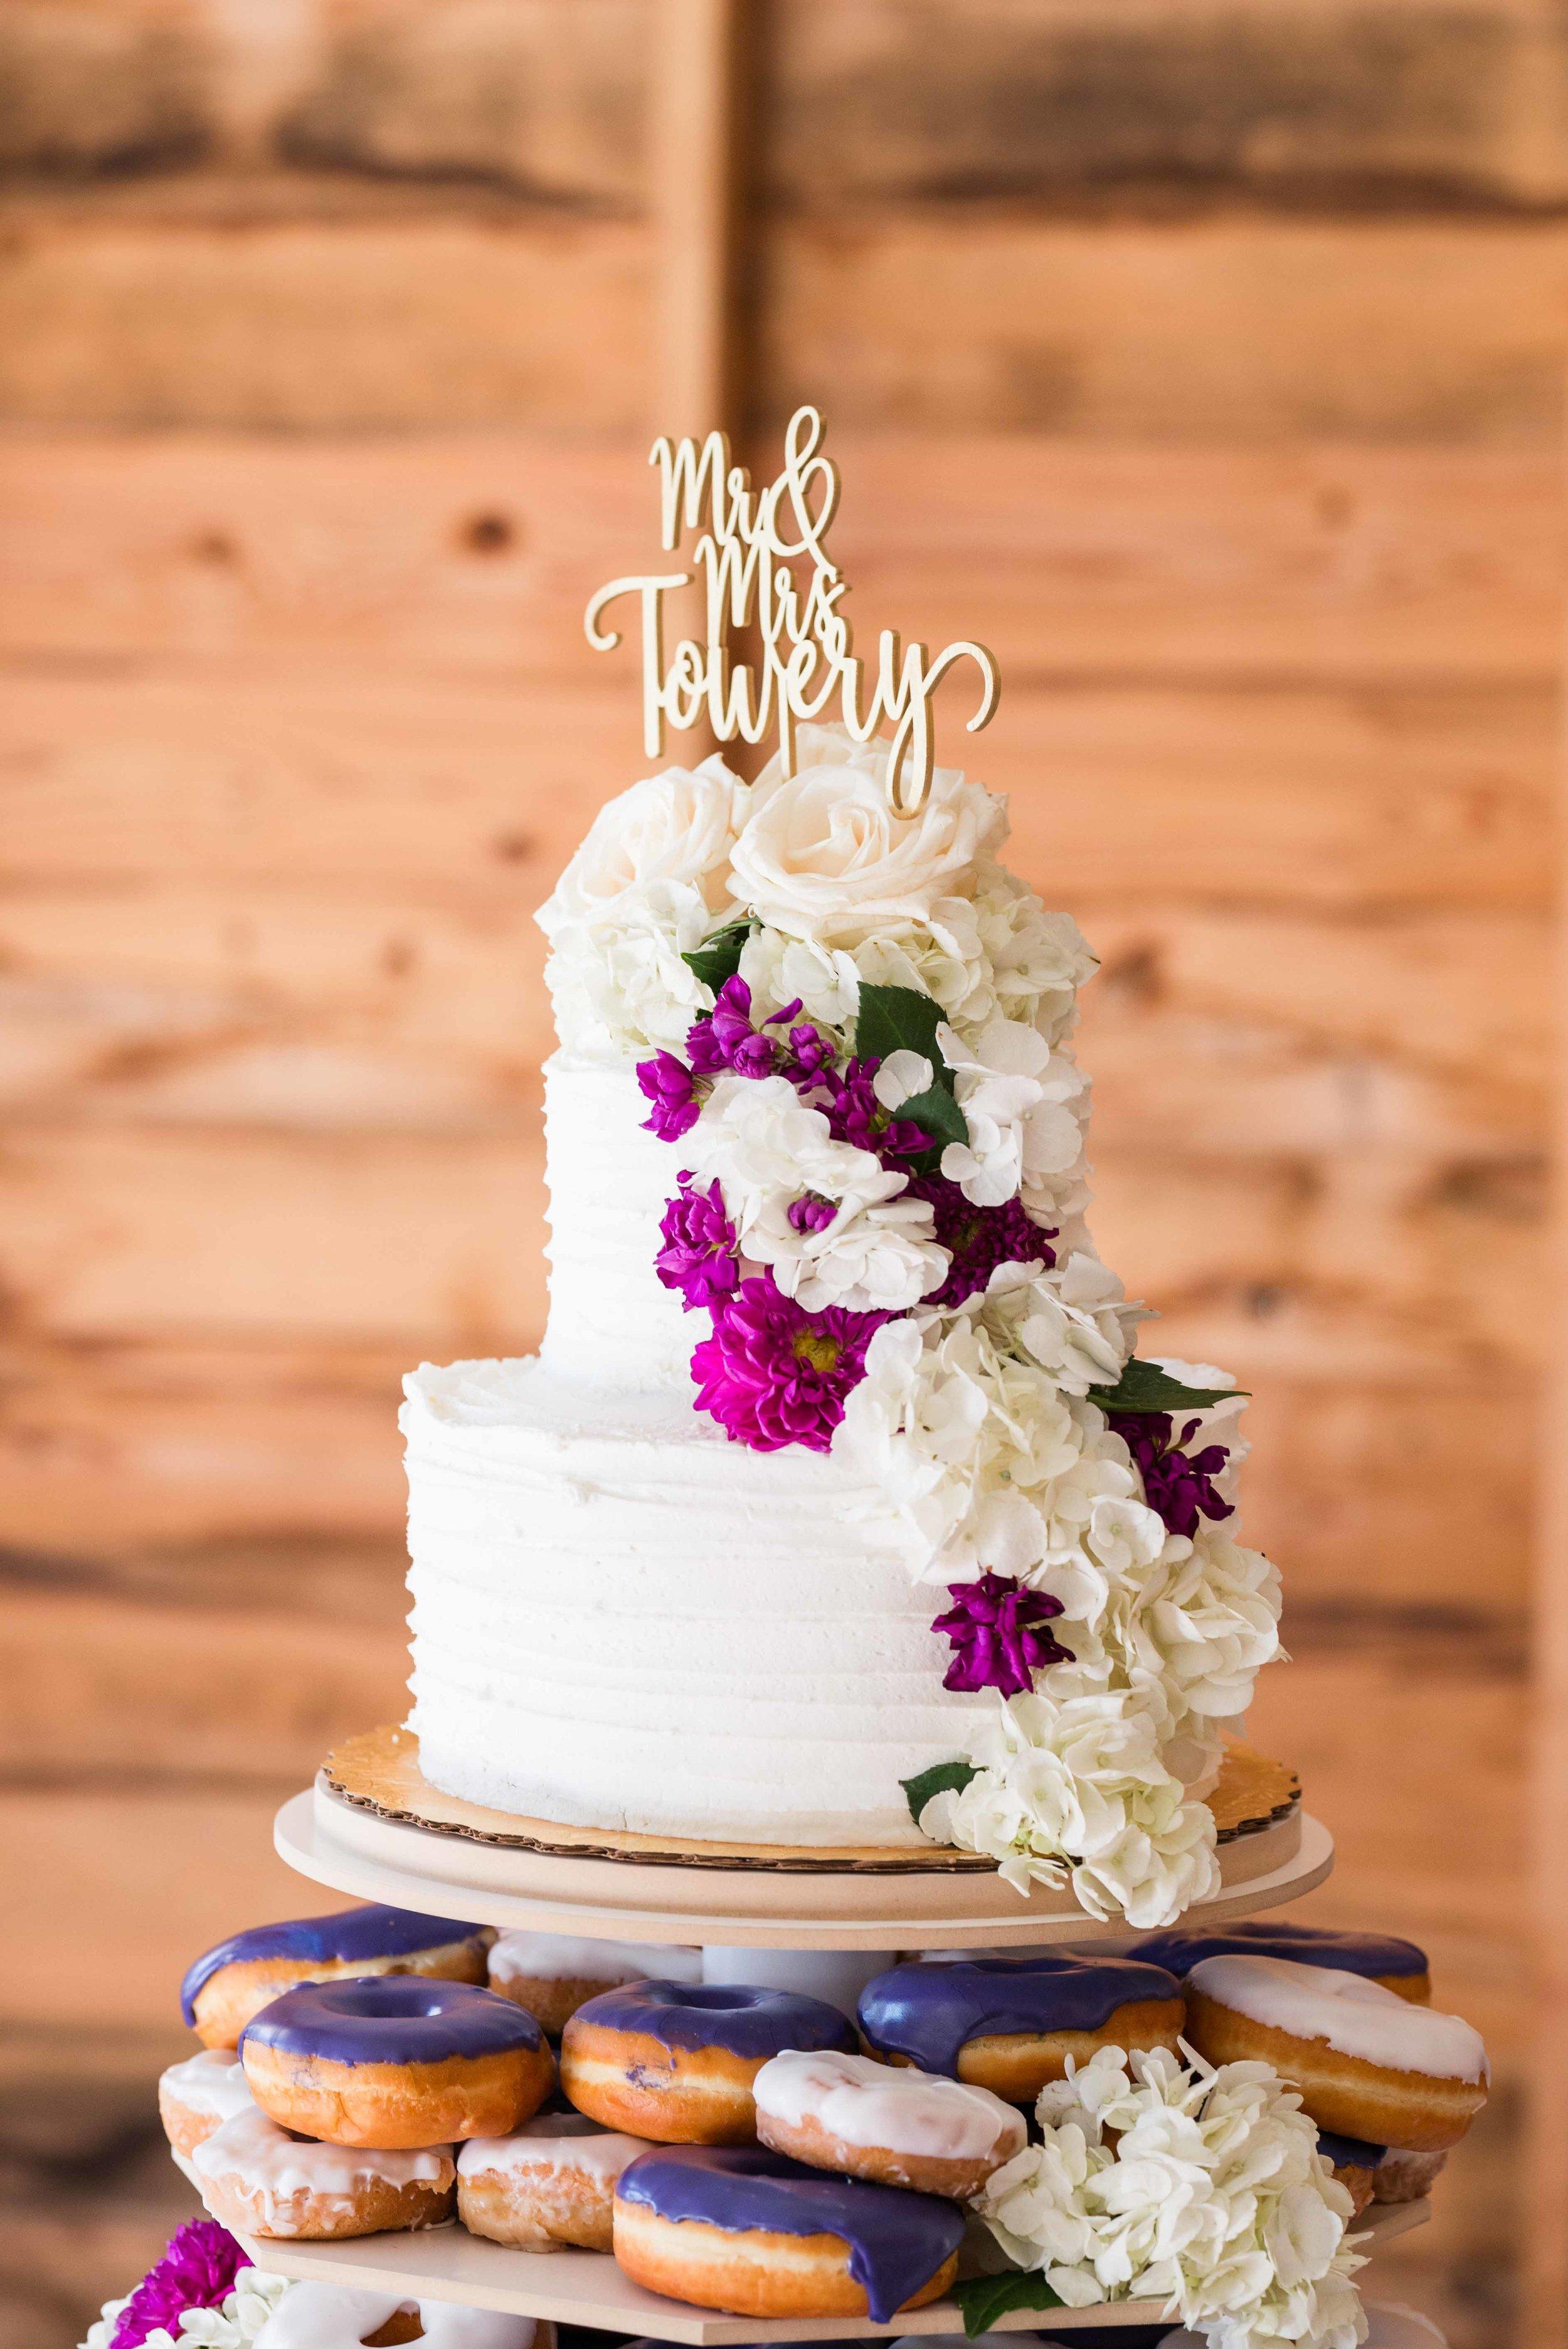 DMP Favs - Towery Wedding-84.jpg